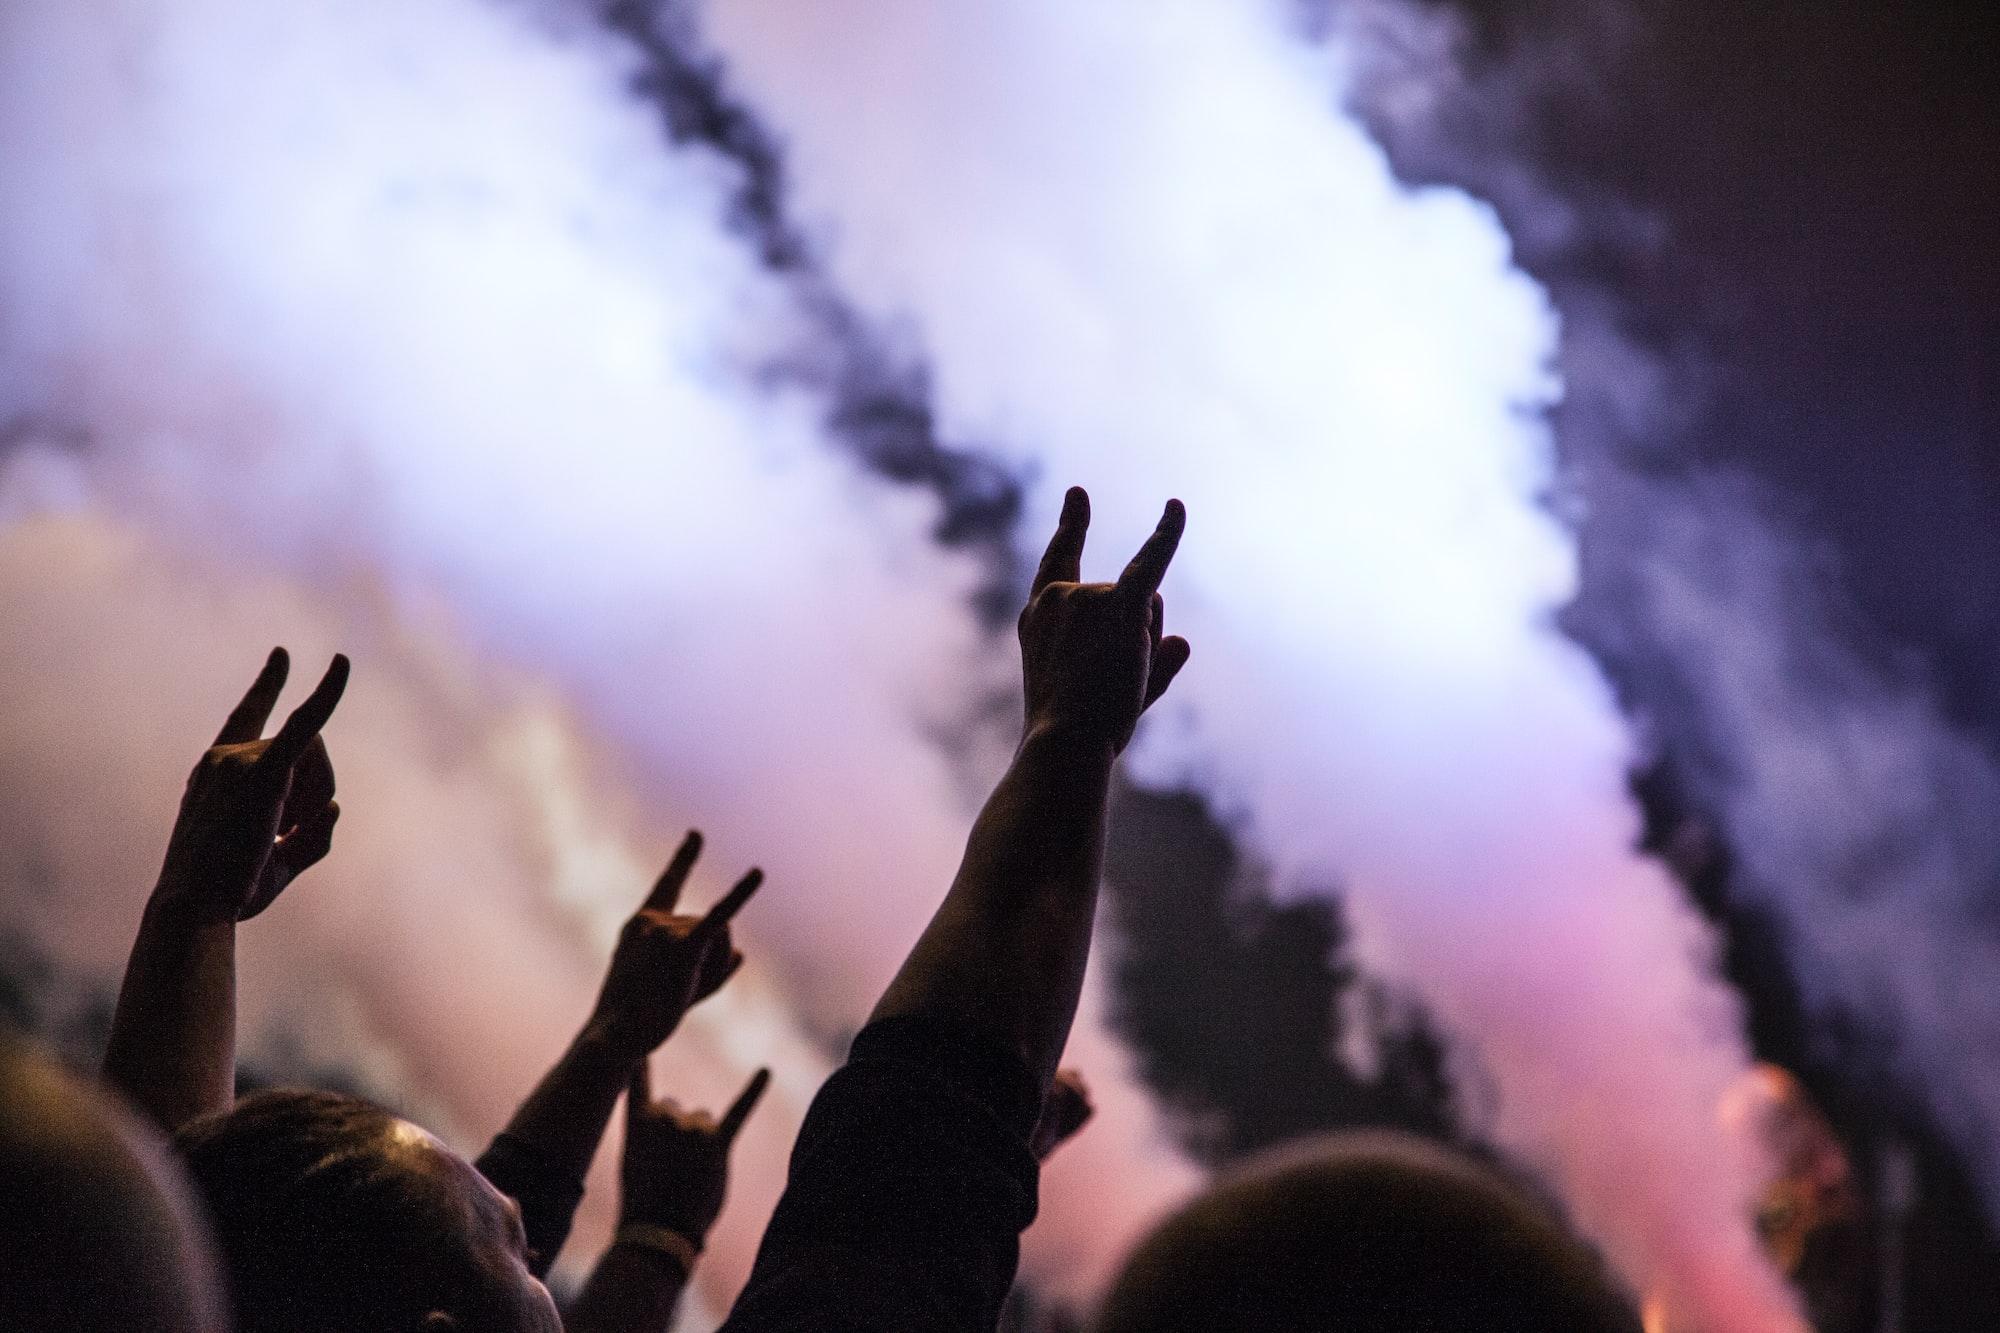 Fans at a rock show